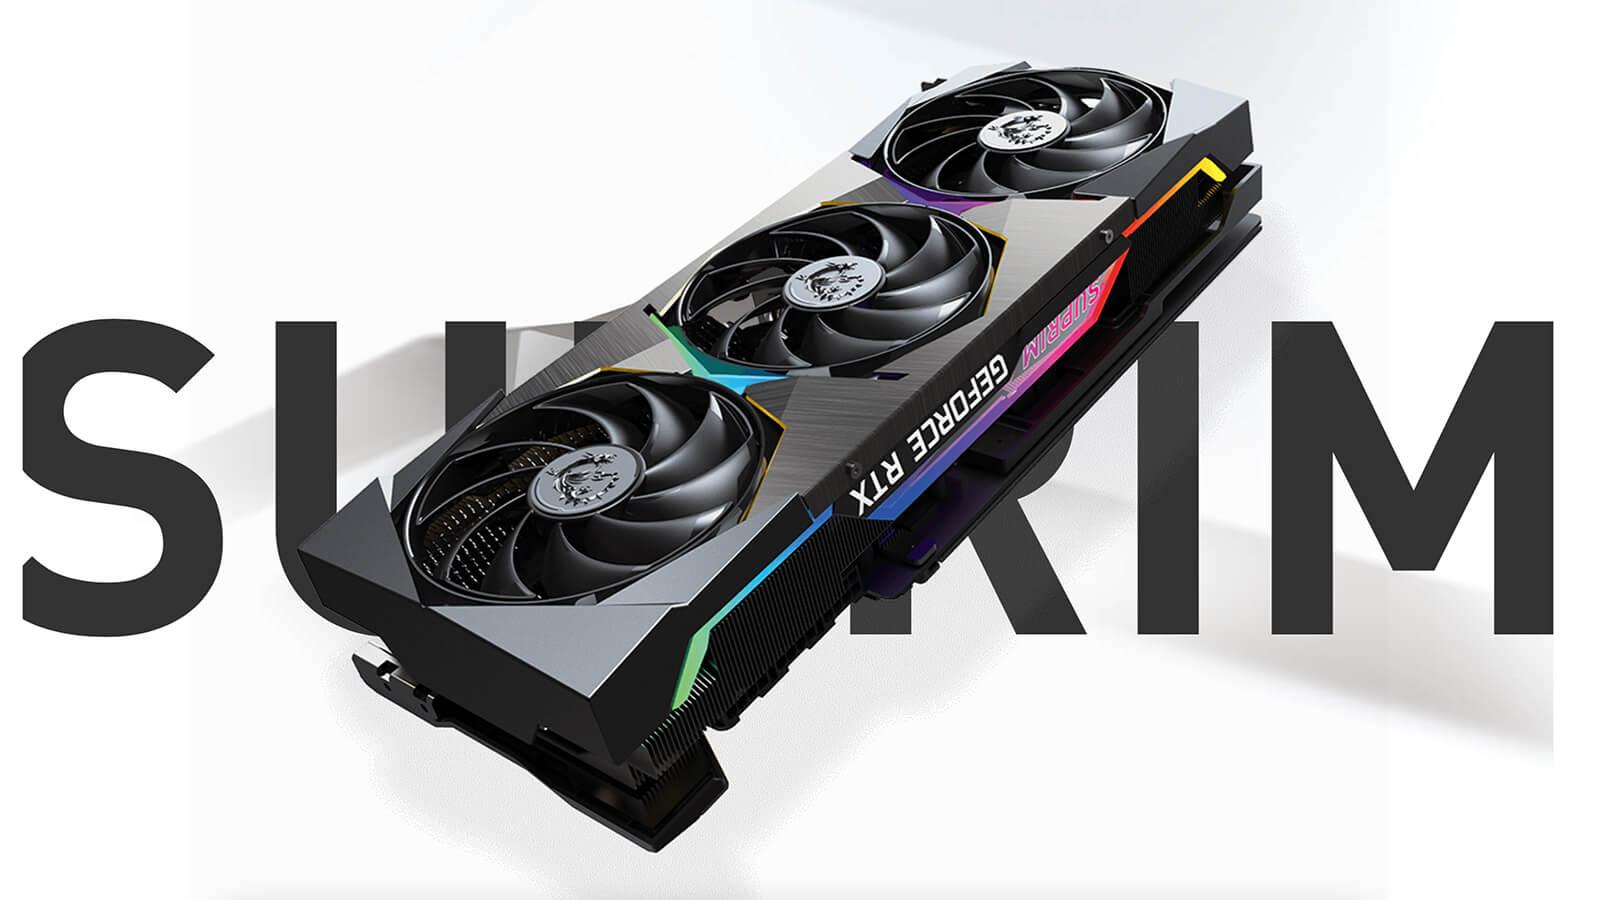 Msi Geforce Rtx 3080 Suprim X 10g 10gb Gddr6x Feature